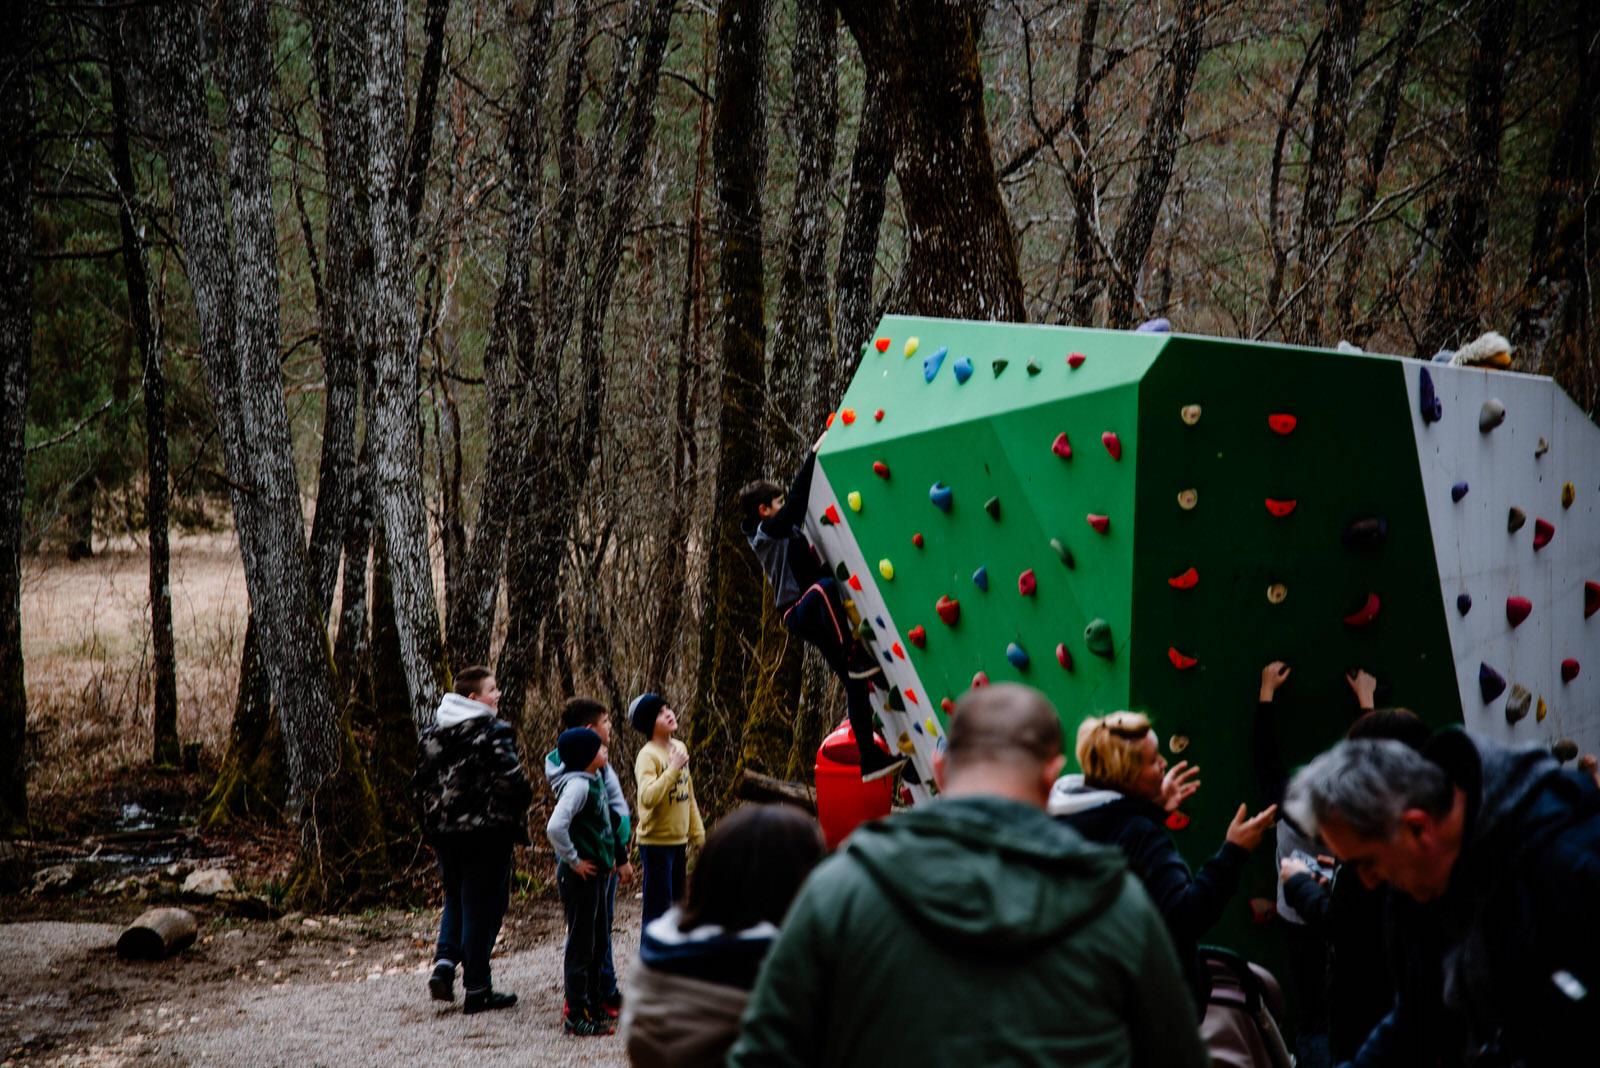 likaclub_gospić_park šuma jasikovac_projekt i video spot_2020 (25)